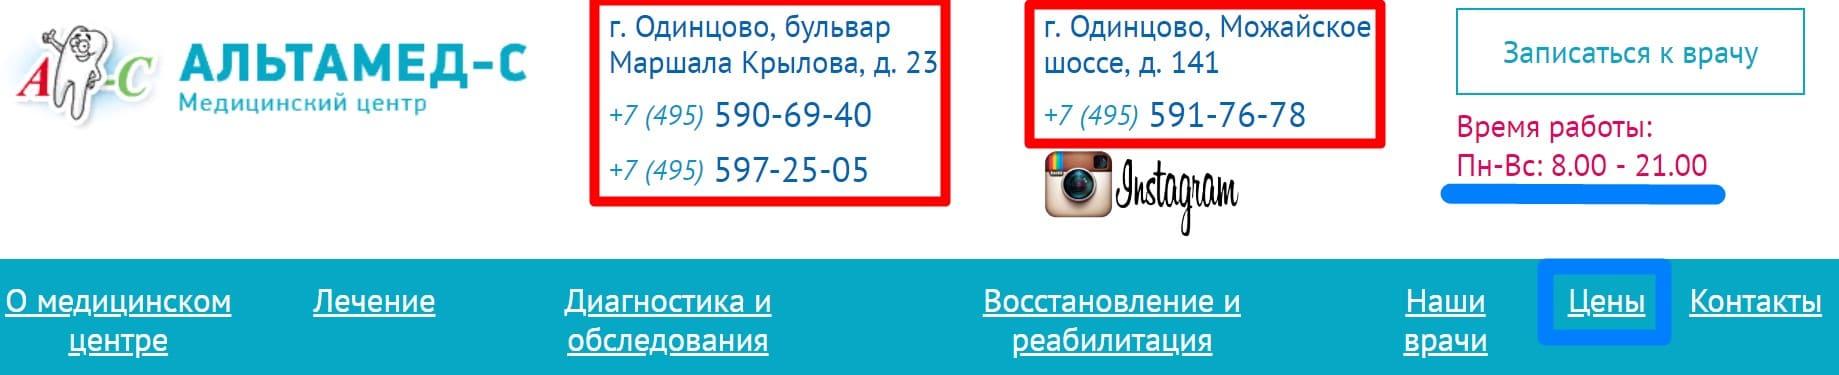 Официальный сайт Альтамед на Крылова